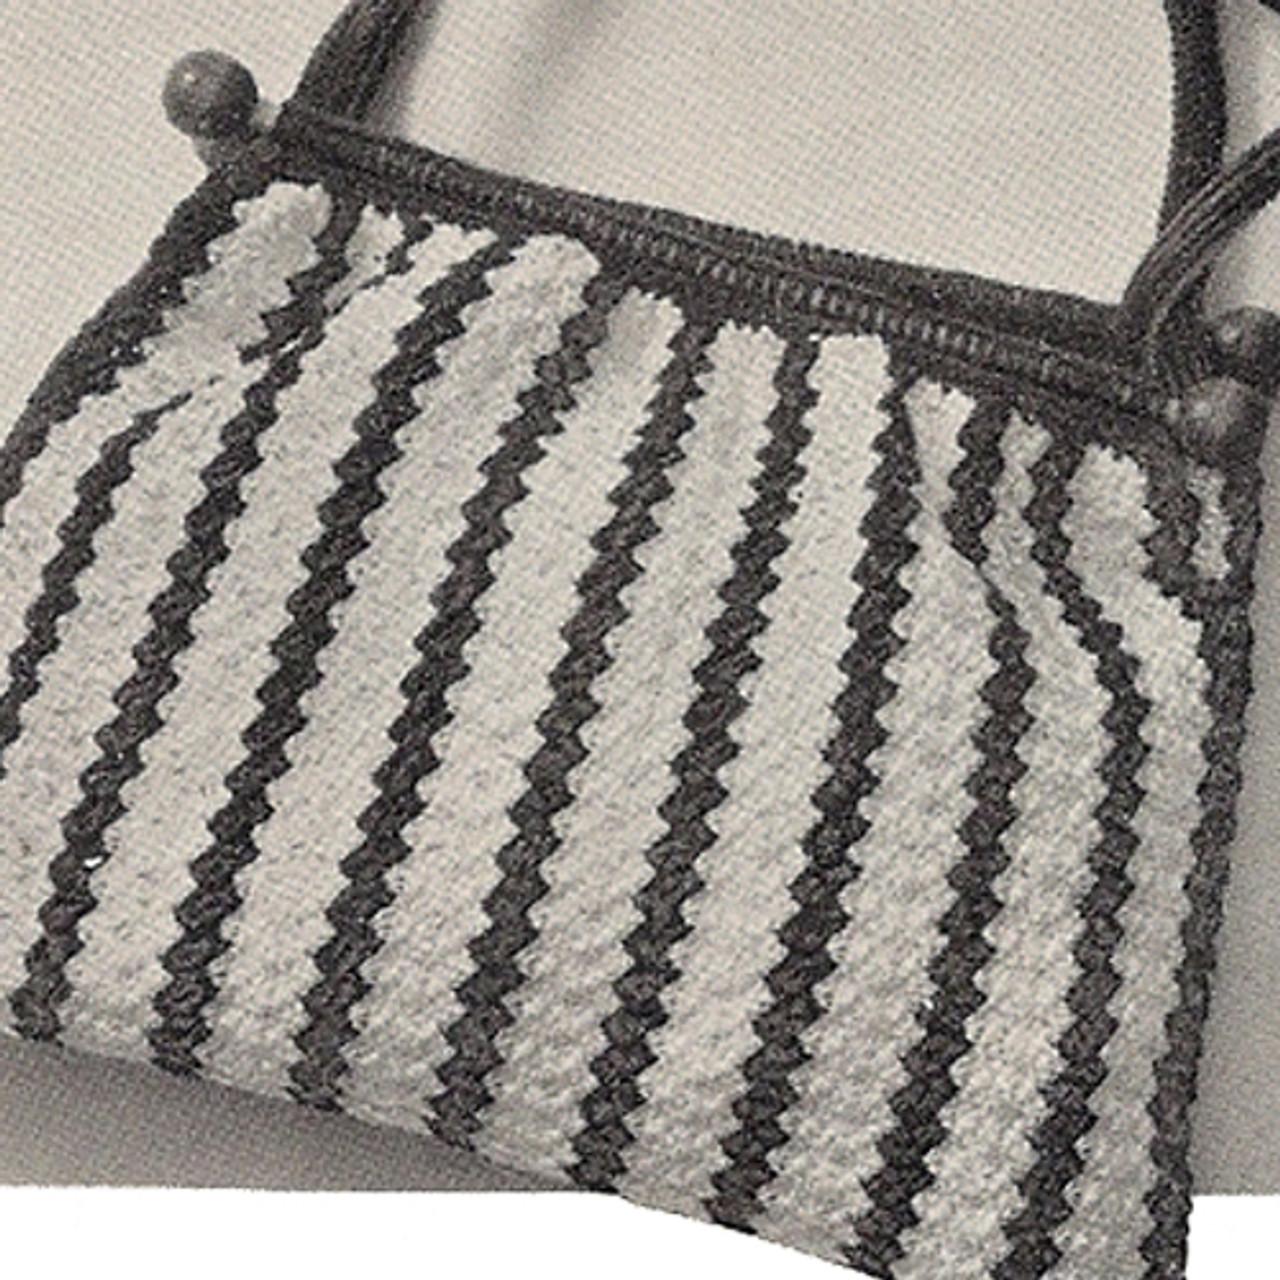 Crocheted Utility Bag Pattern